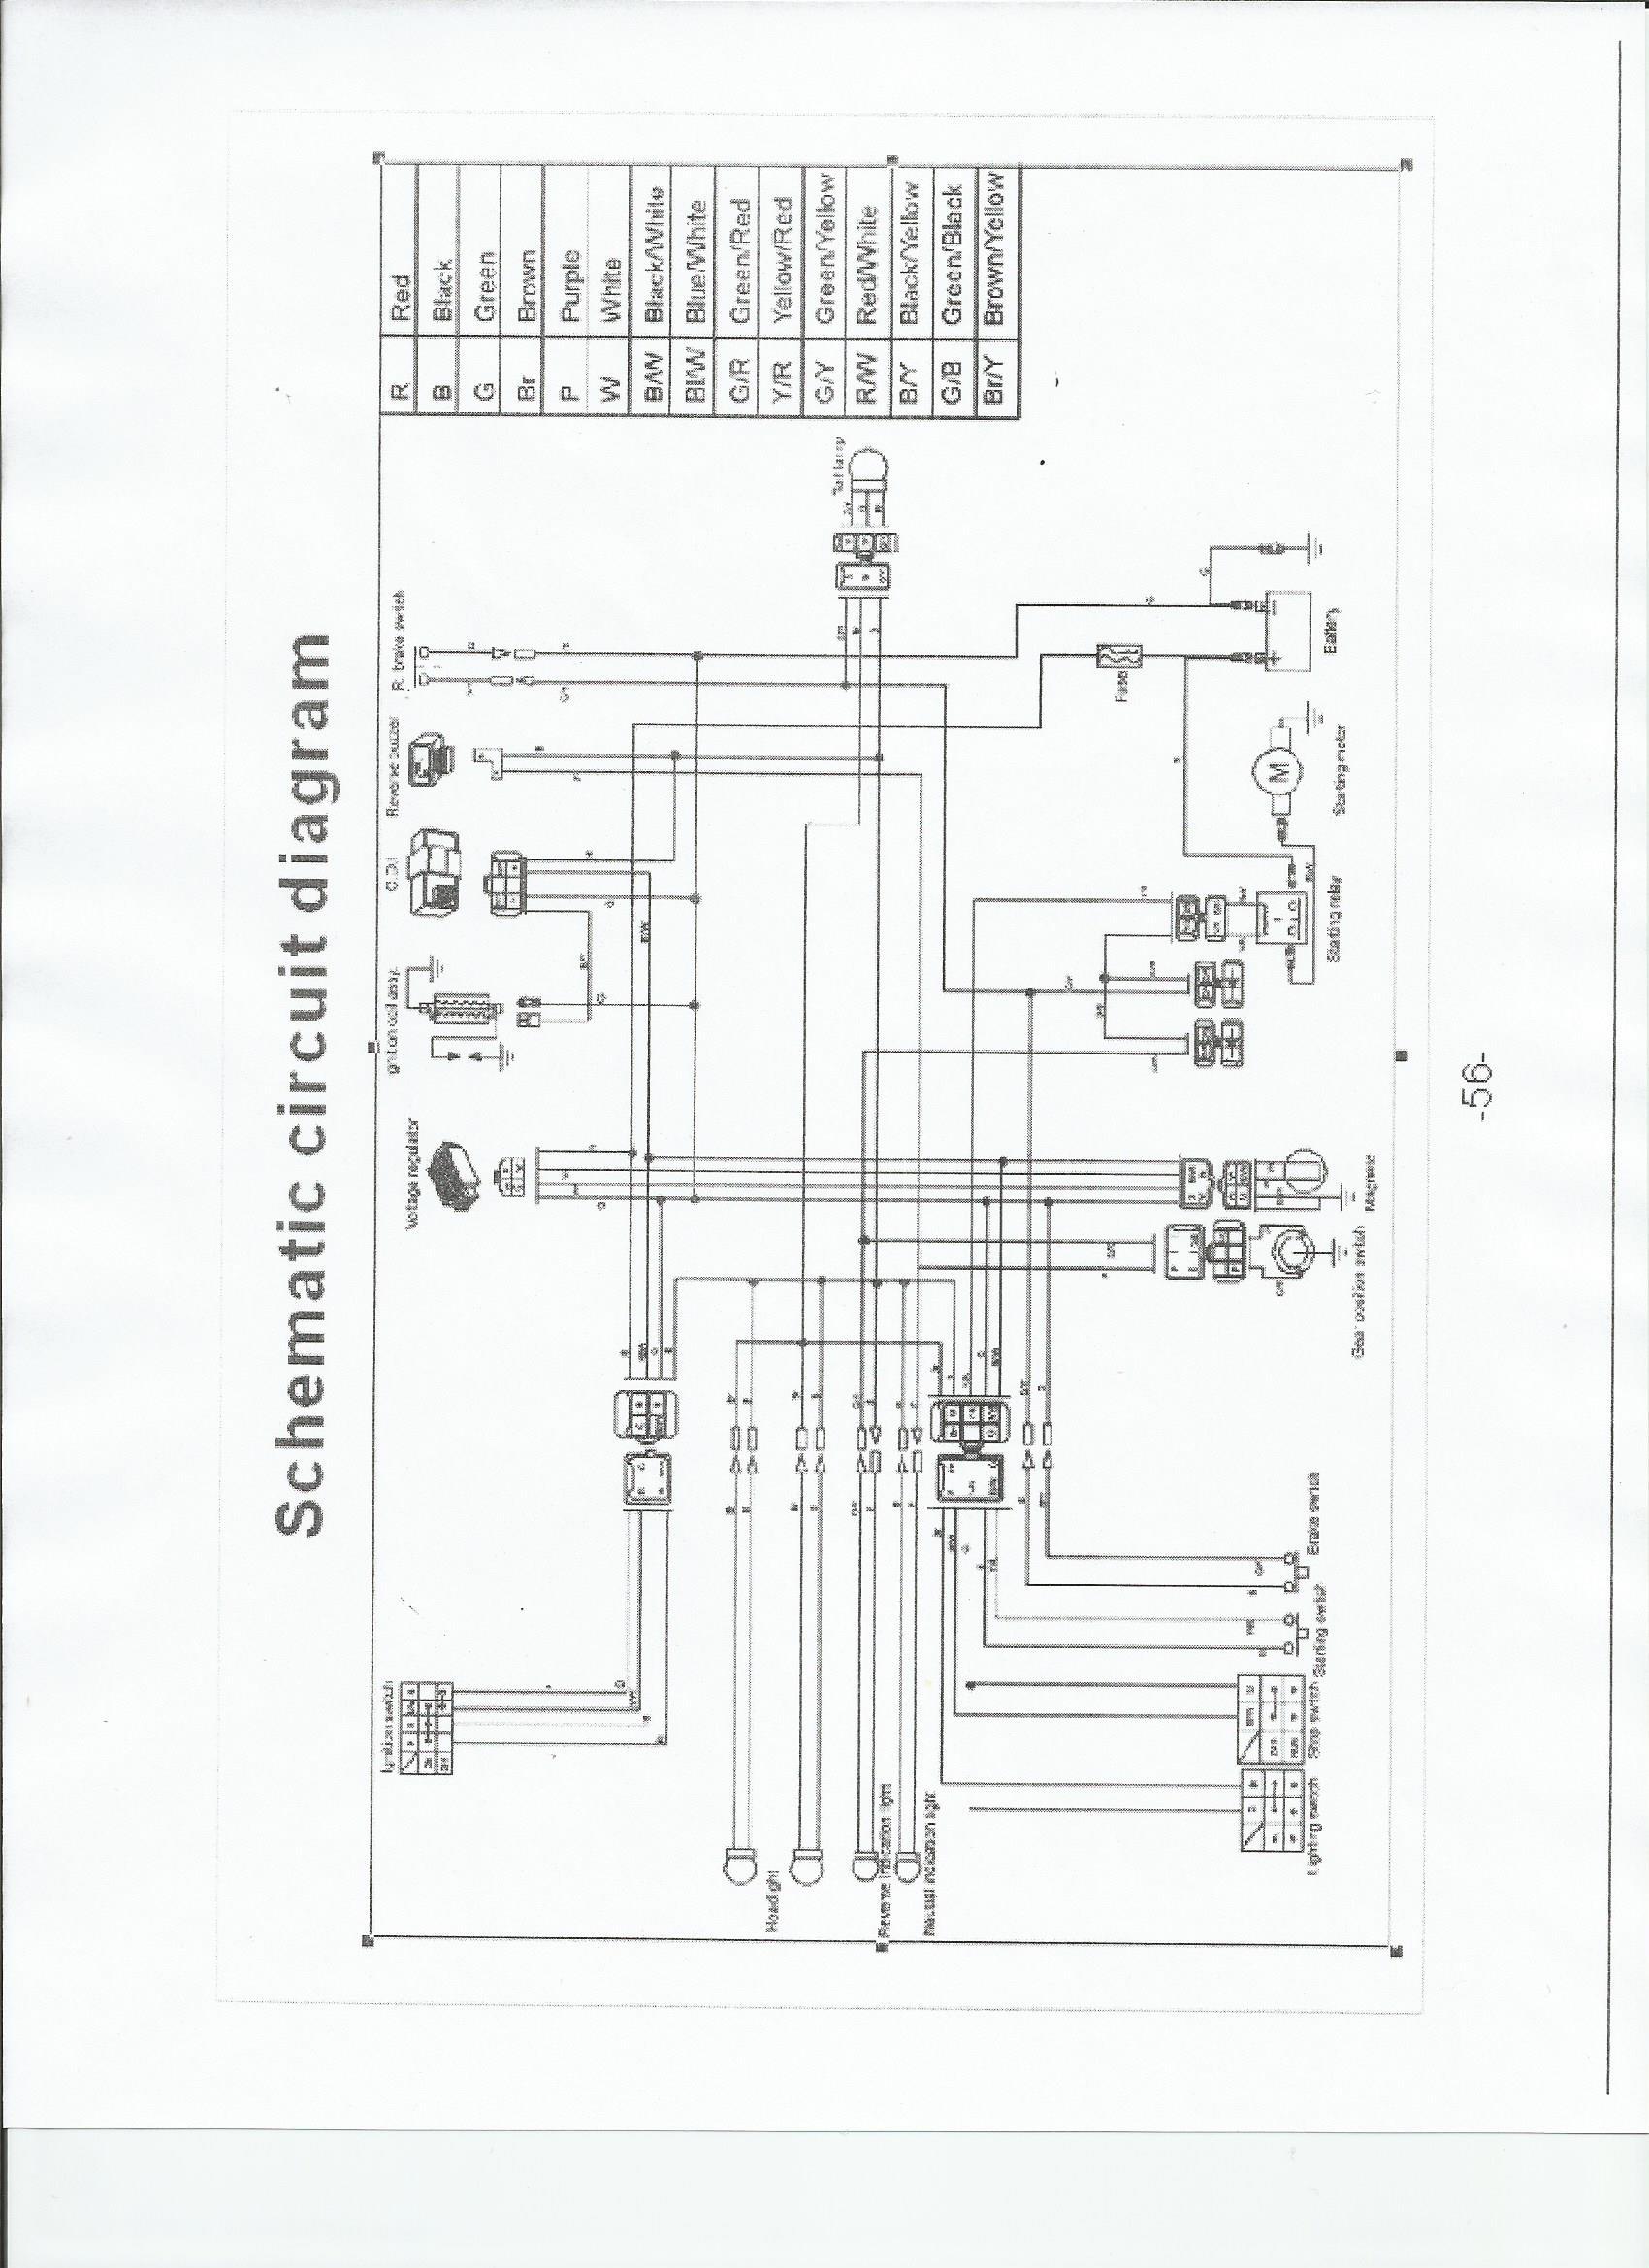 ssr 250 quad wiring diagram wiring diagramssr 110 wiring diagram 20 manualuniverse co u2022 [ 1700 x 2338 Pixel ]